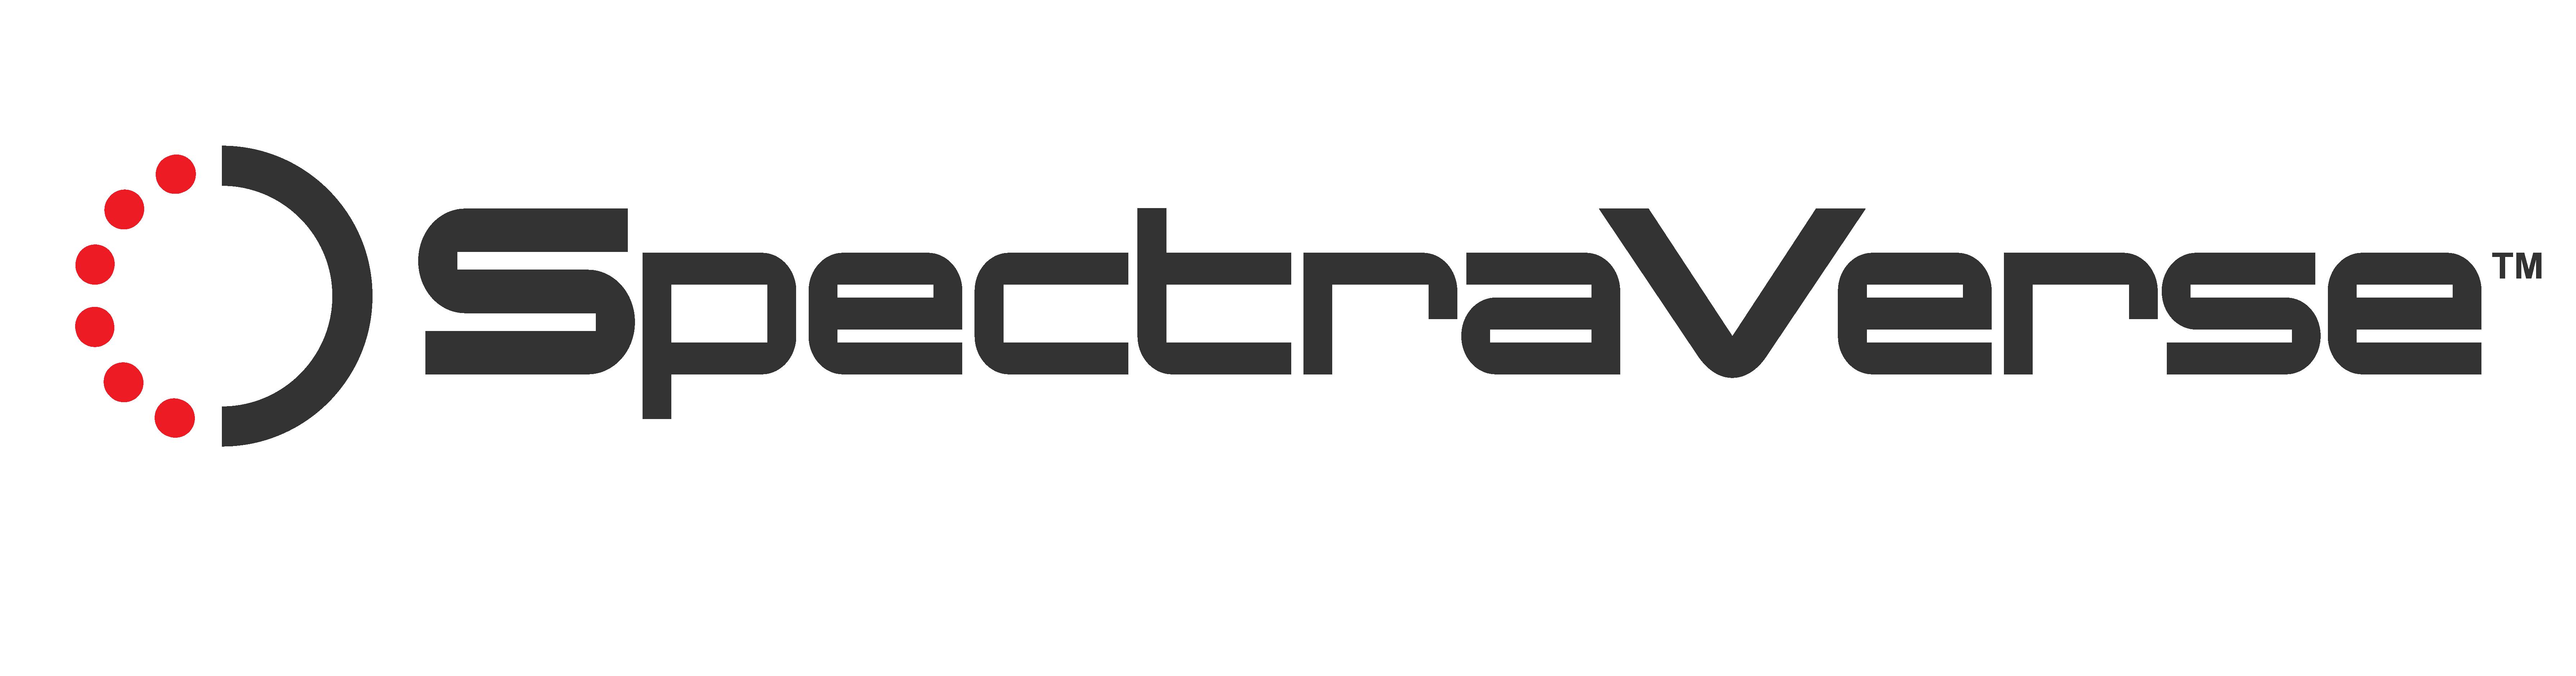 Spectraverse - black-05